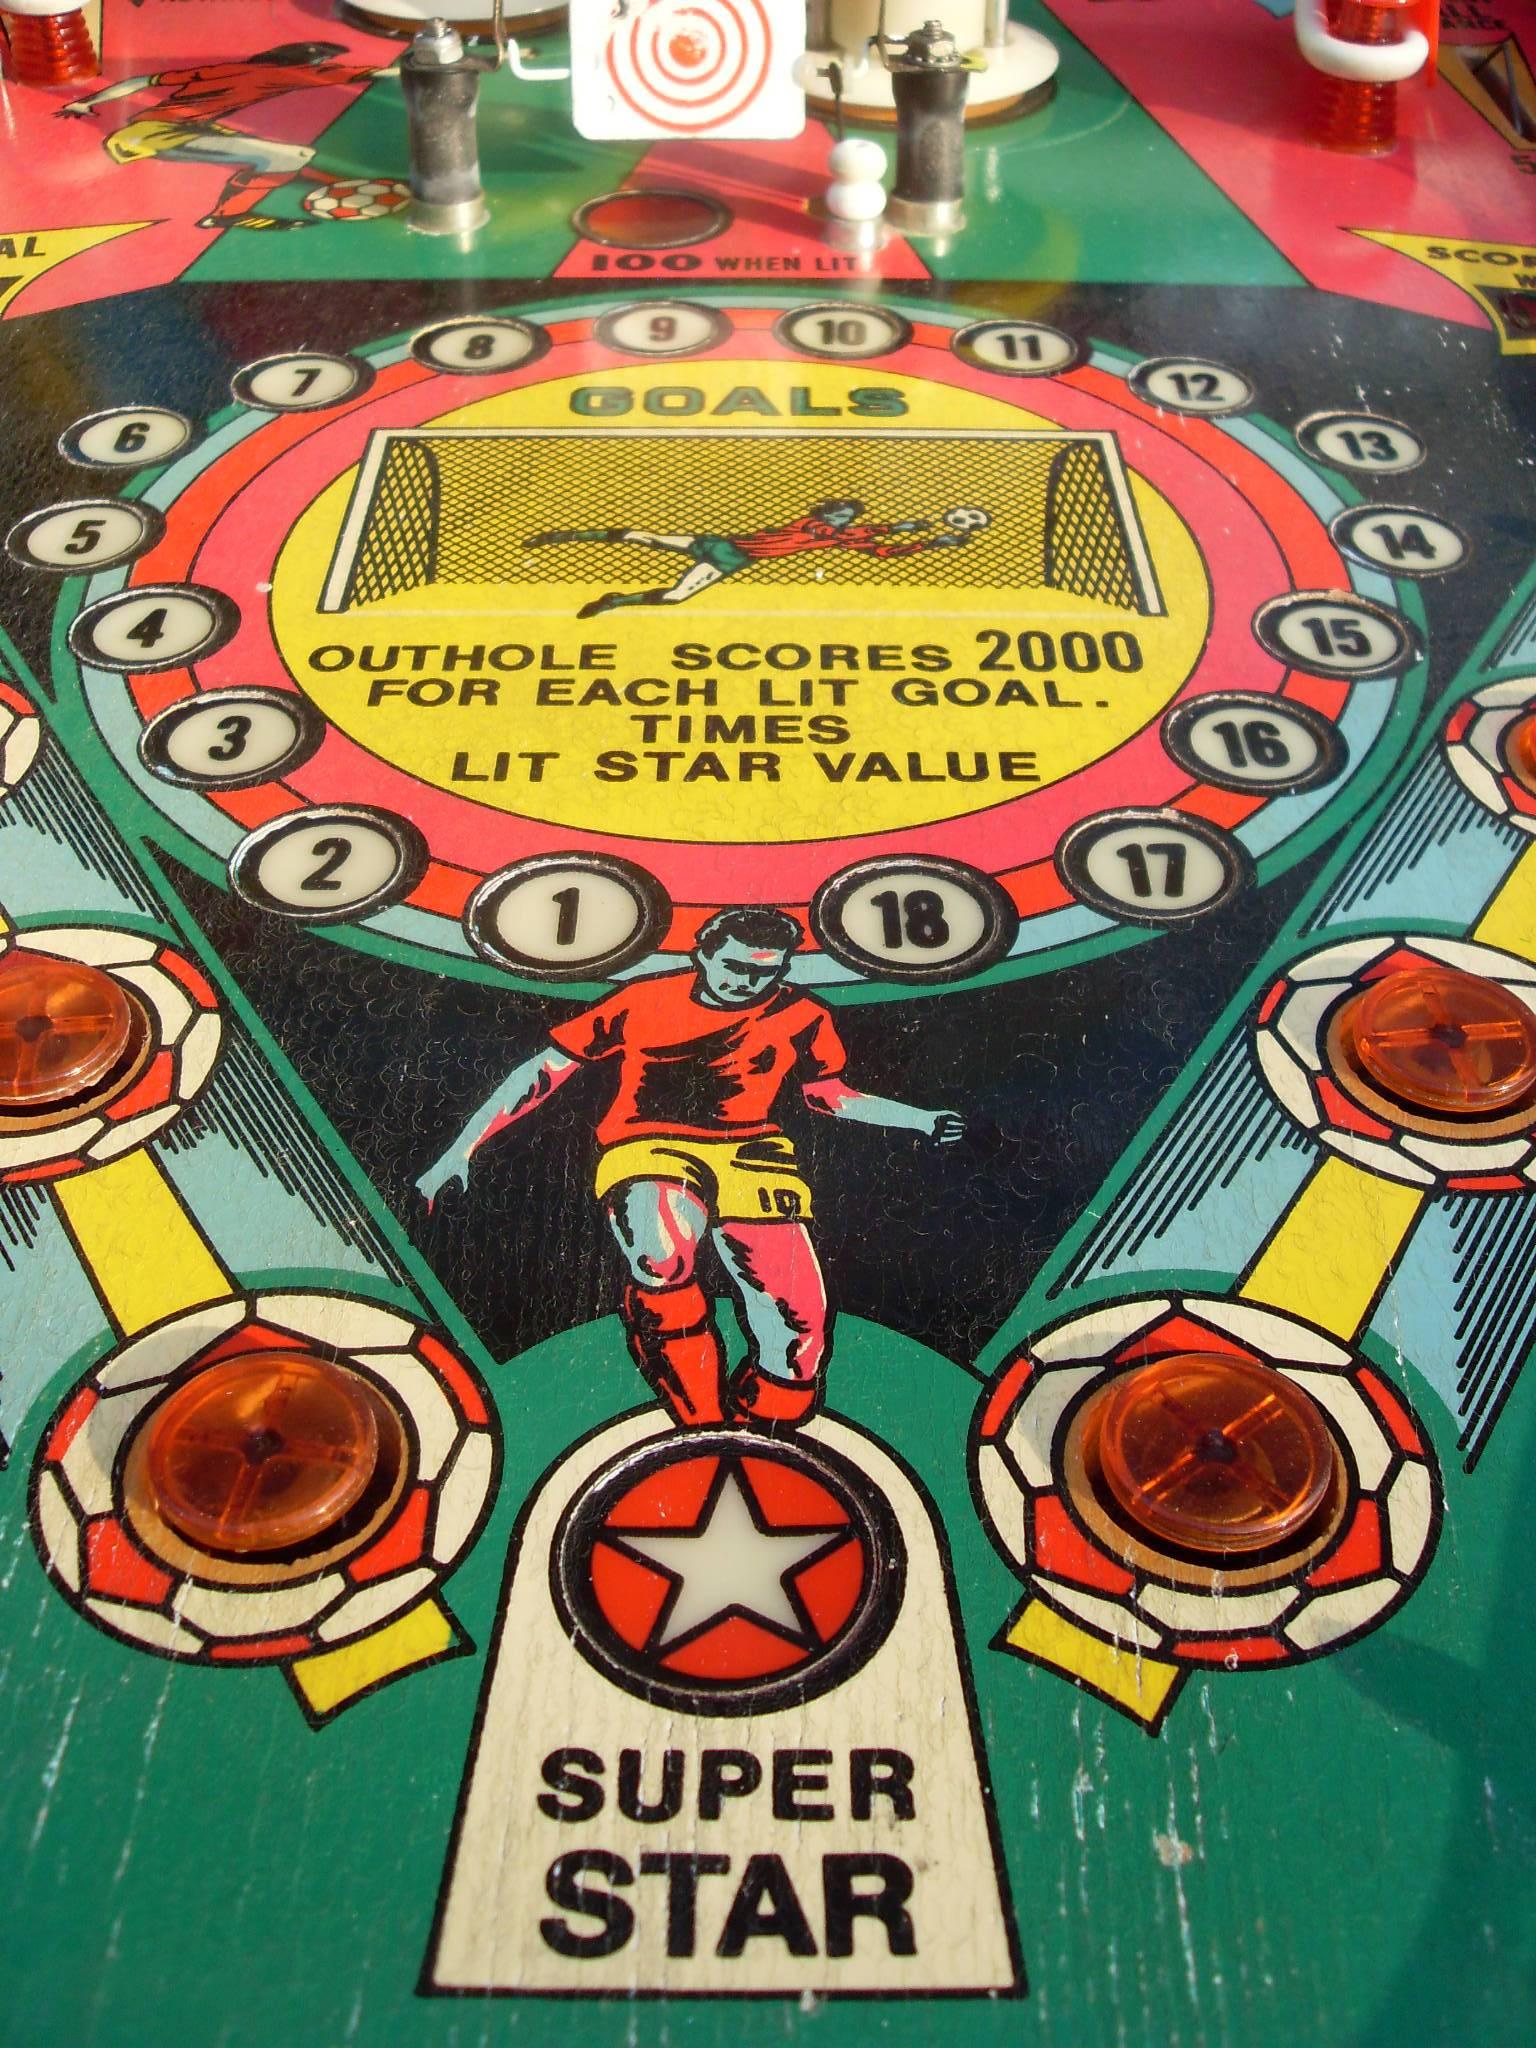 1978 williams world cup pinball machine